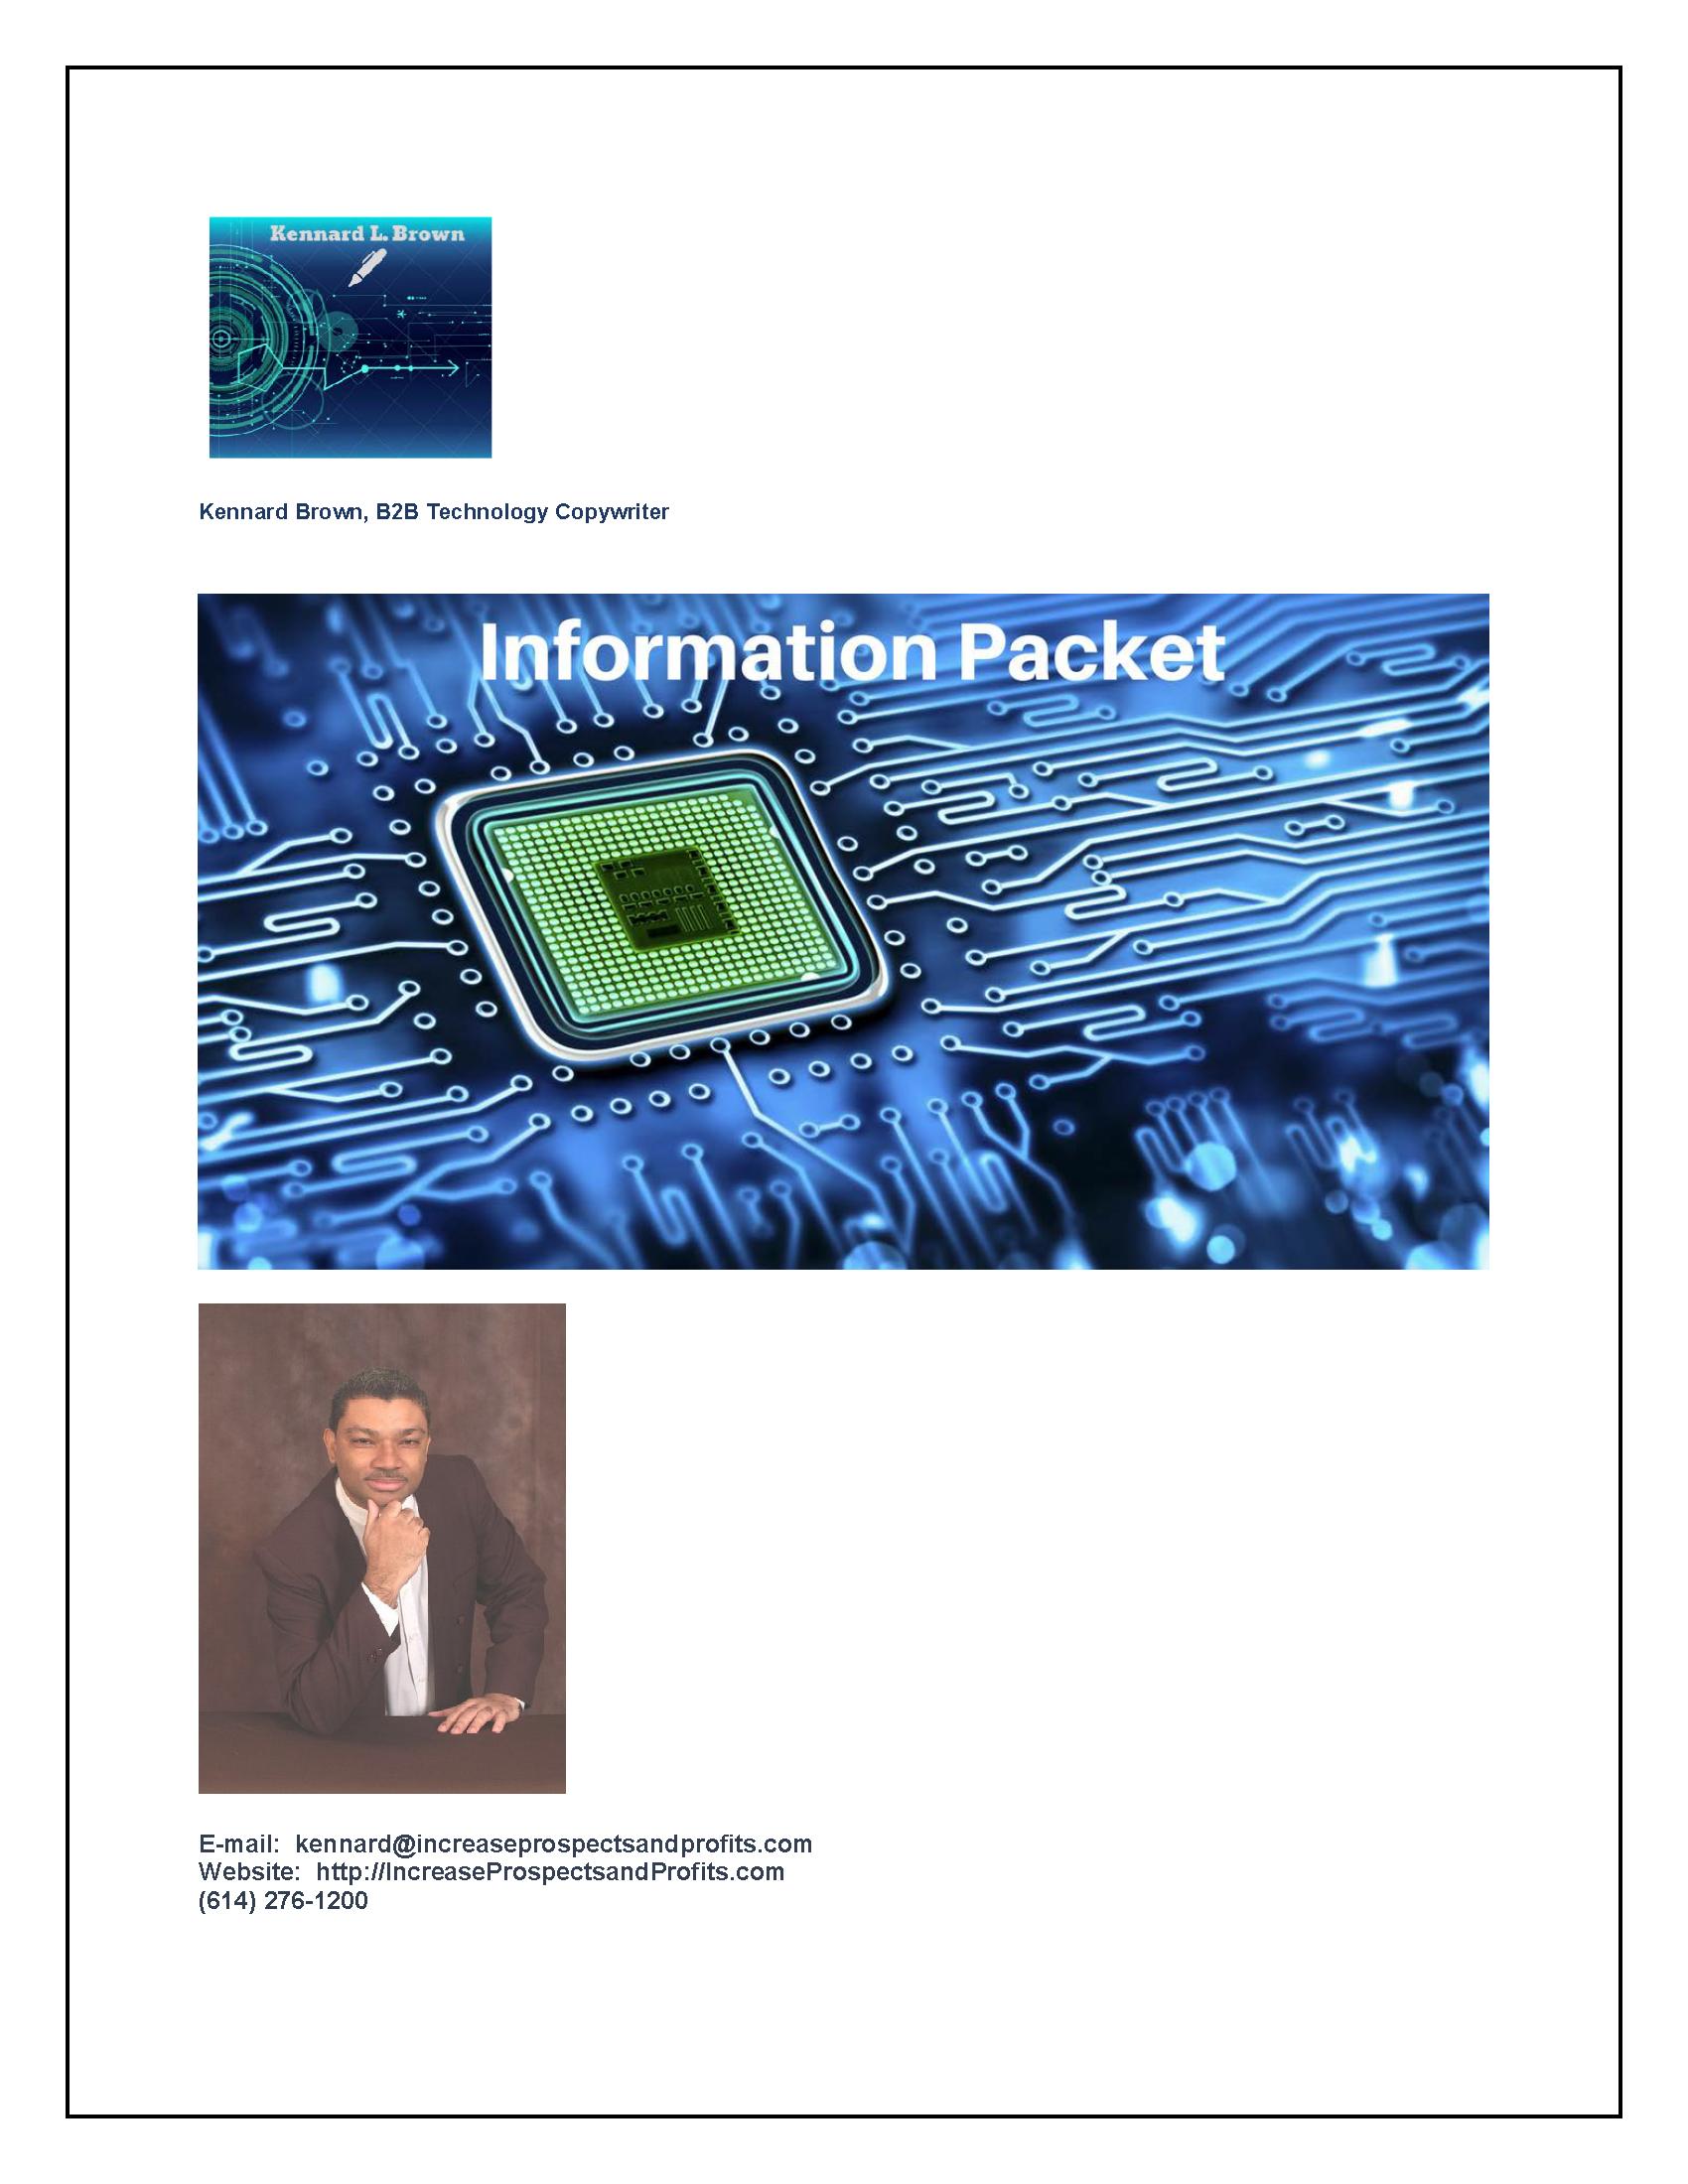 B2B Tech Information Packet